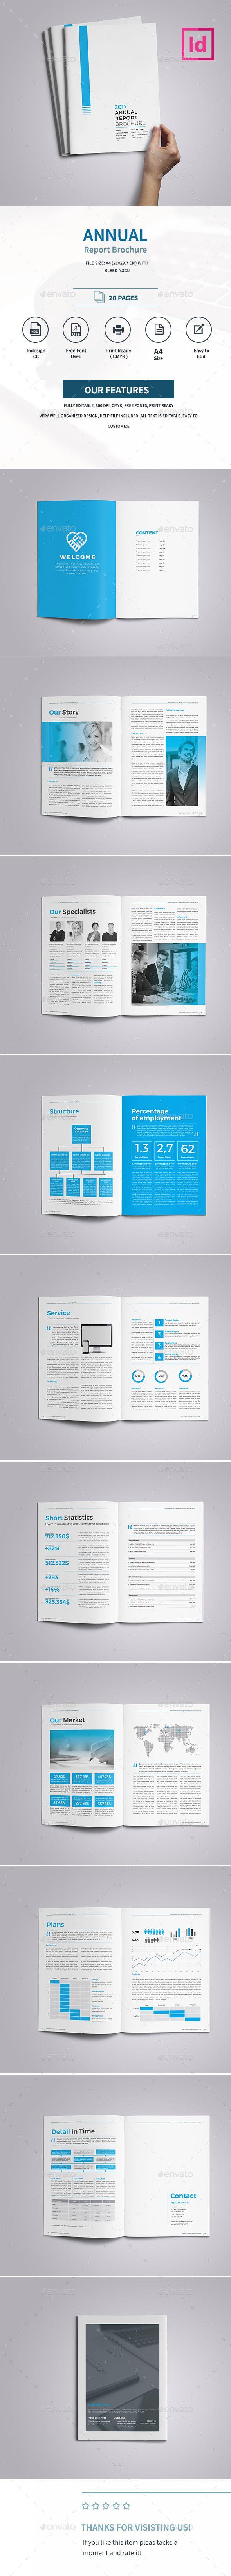 Corporate Annual Report Brochure 2017 — InDesign Template #corporate ...